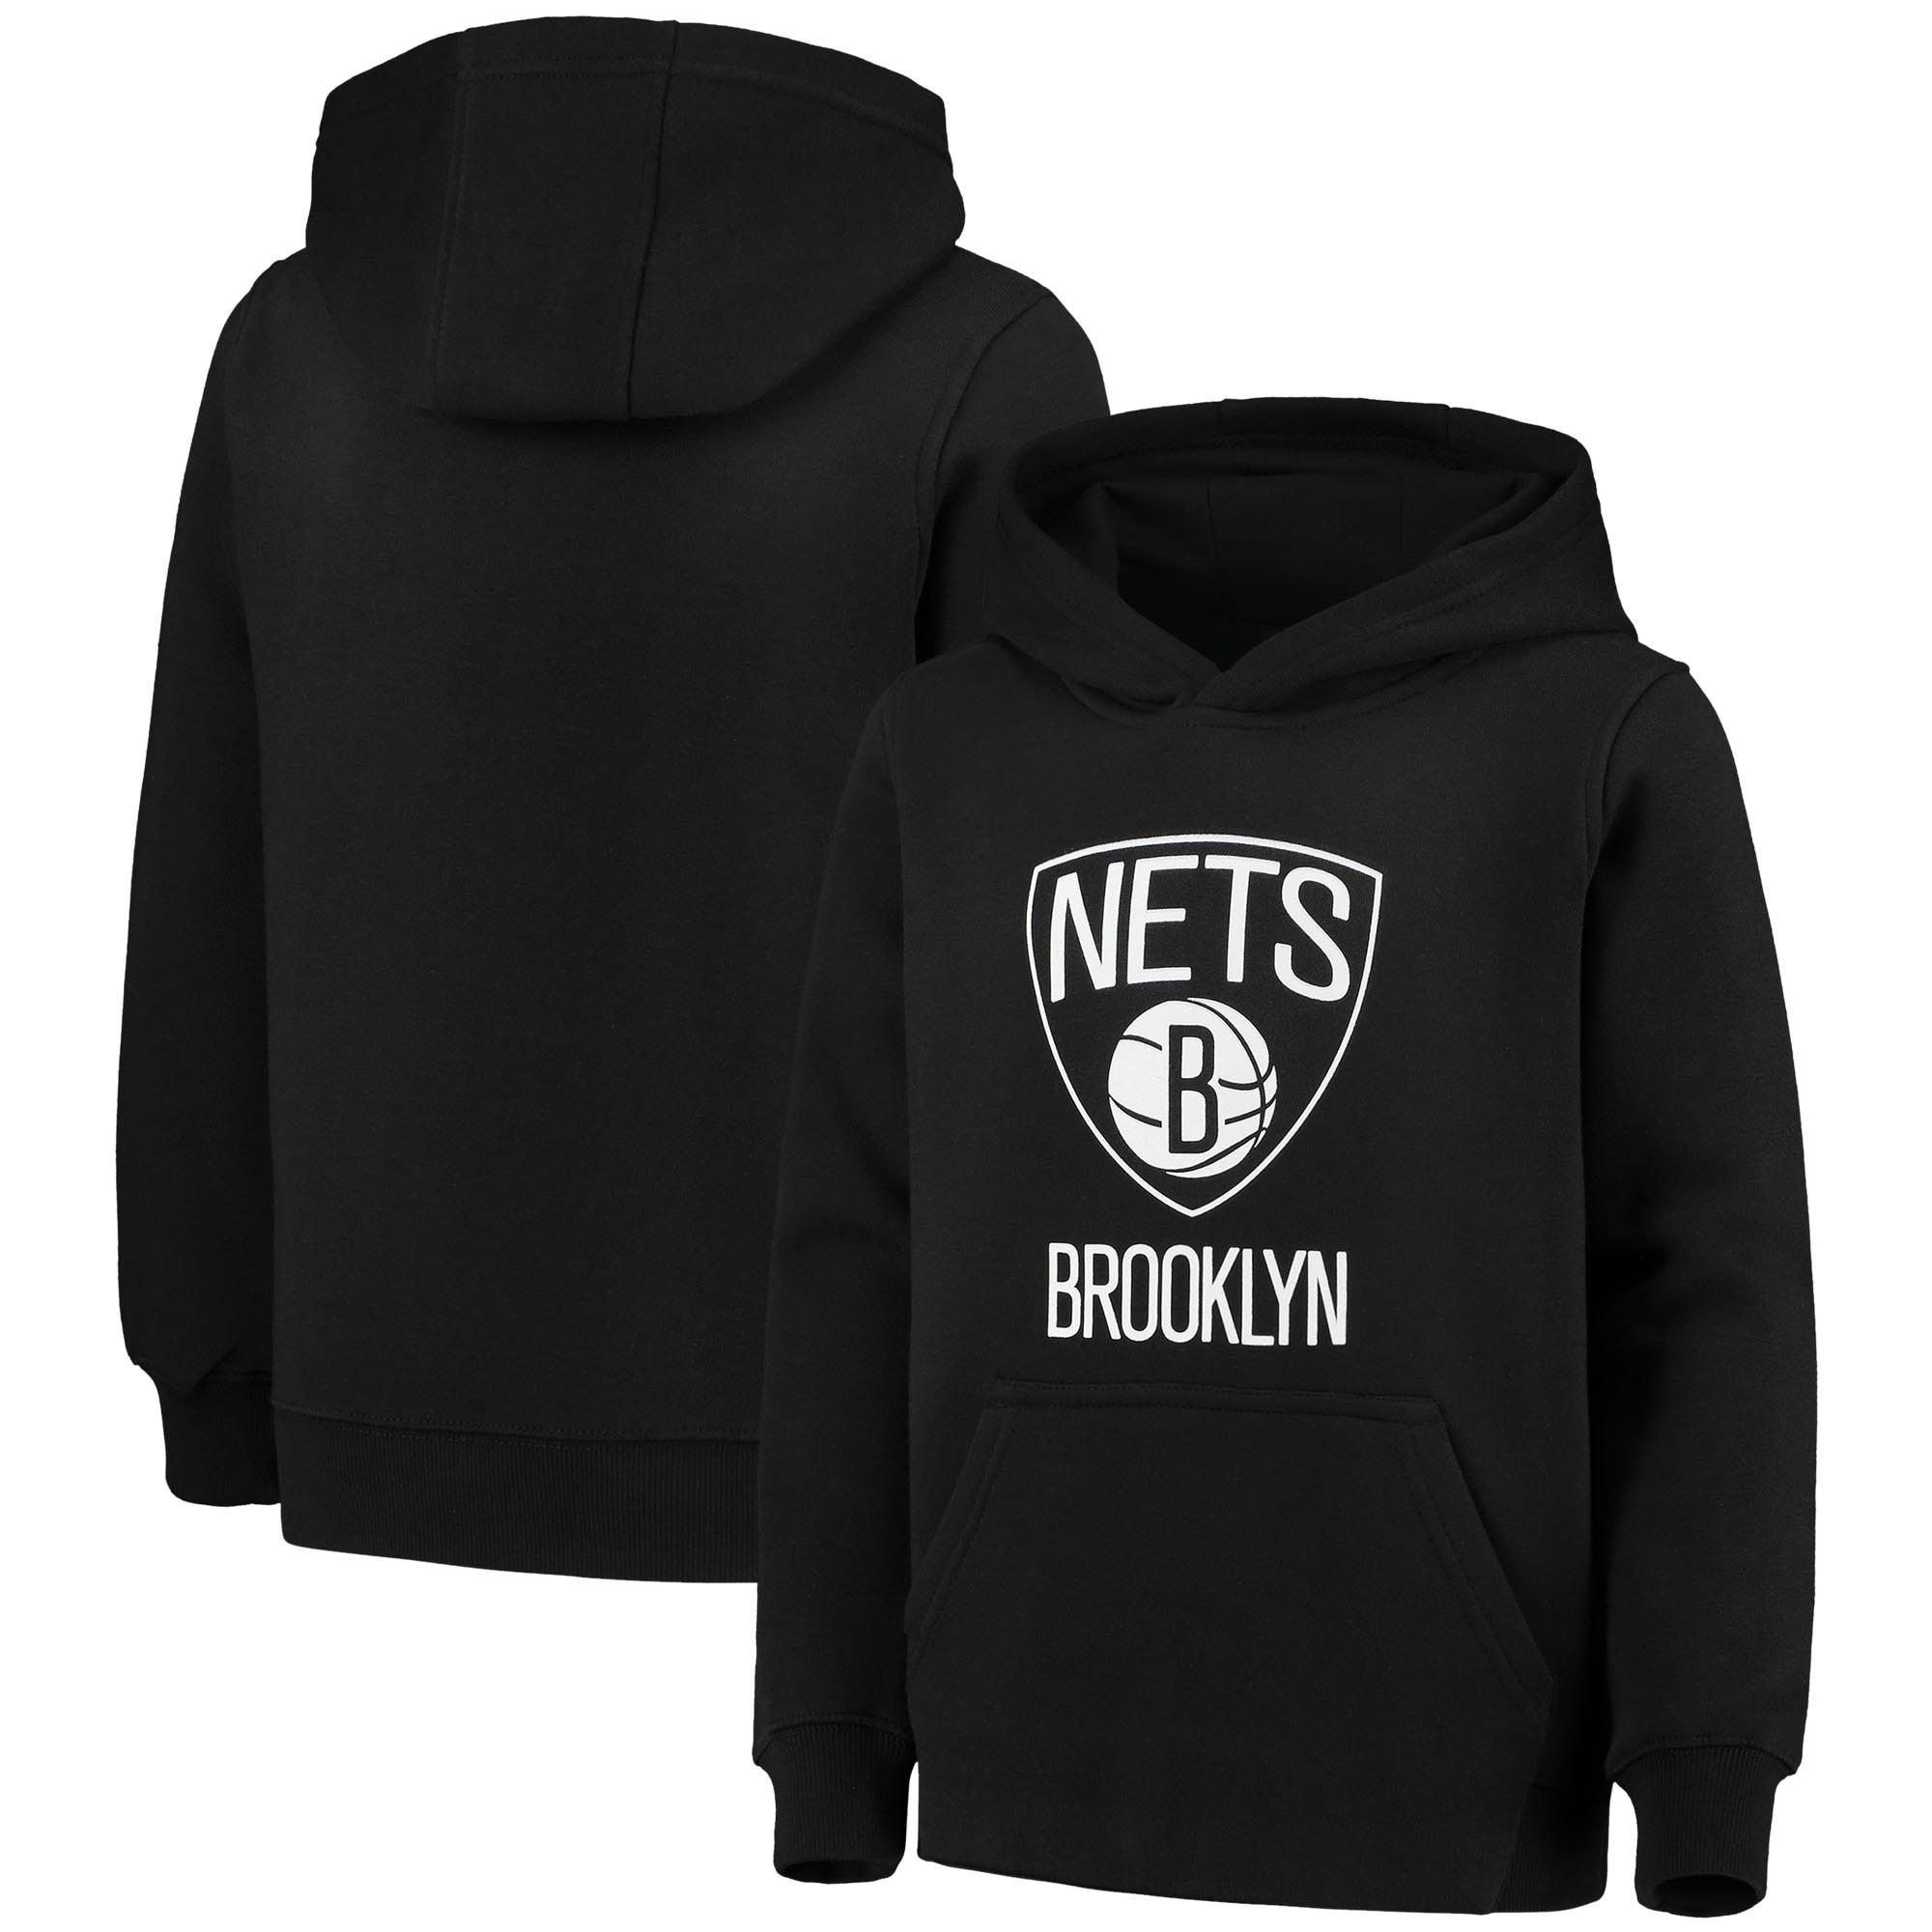 Brooklyn Nets Youth Primary Logo Fleece Pullover Hoodie - Black